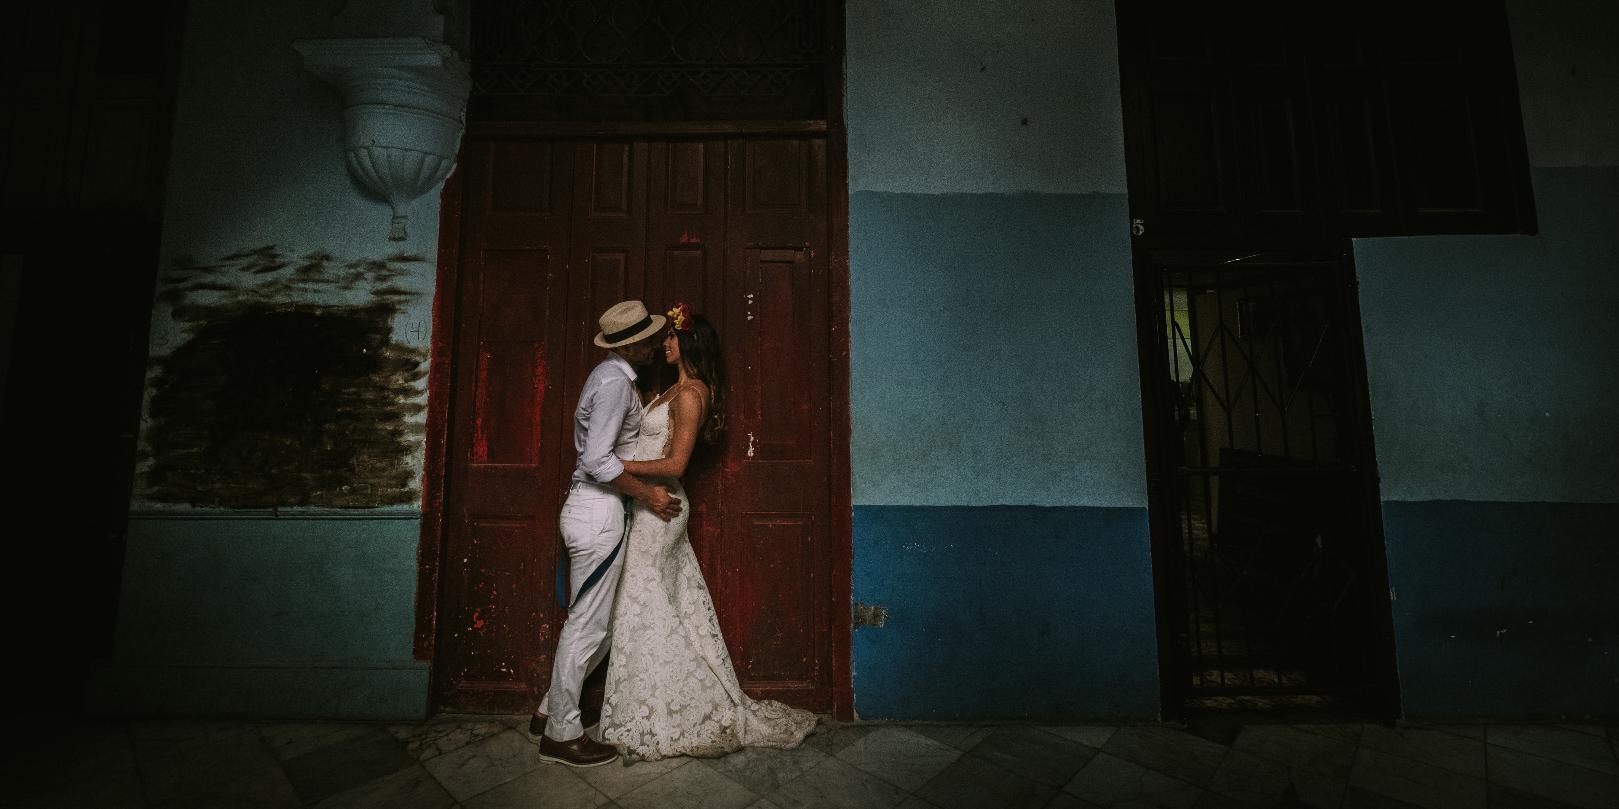 bodas-sin-clasificar-sin-tema-cuba-28931.jpg